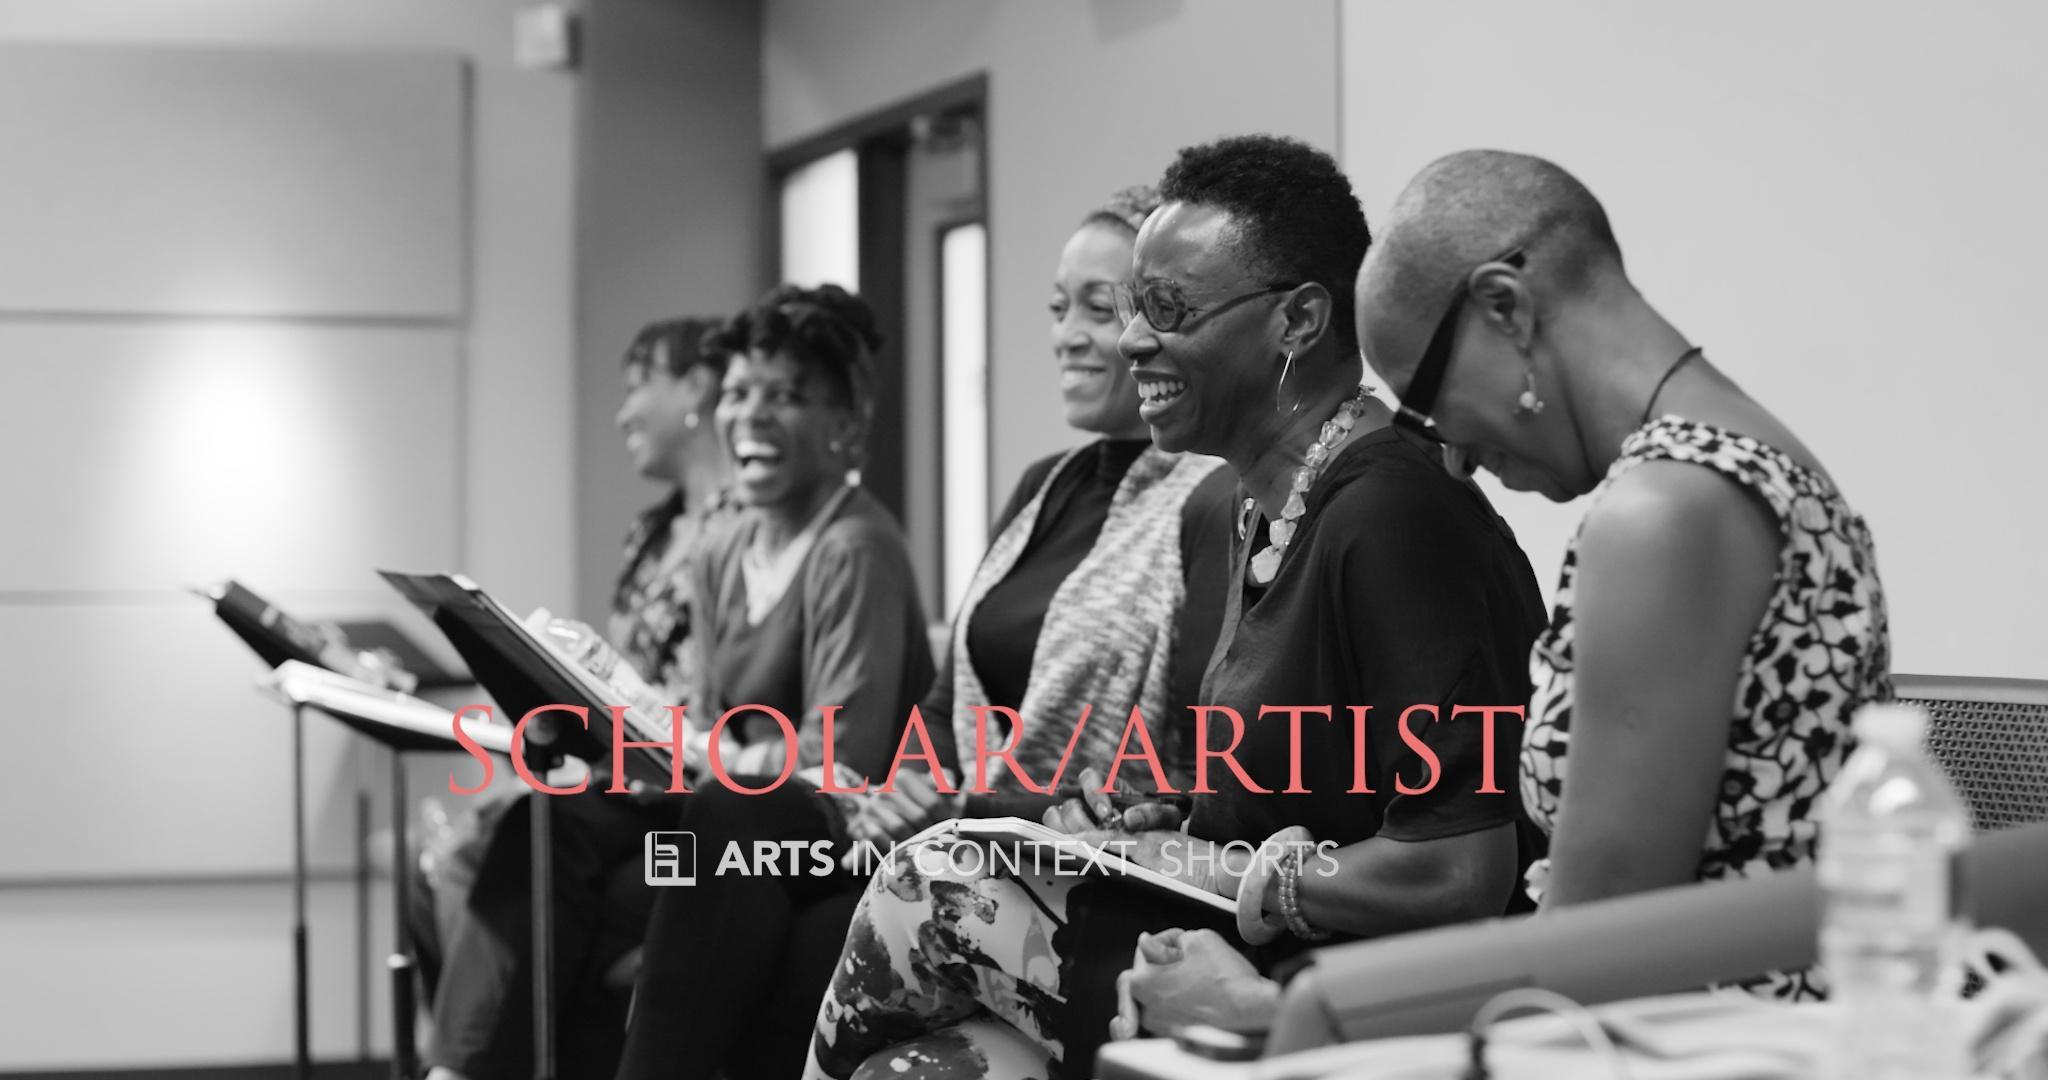 Scholar/Artist